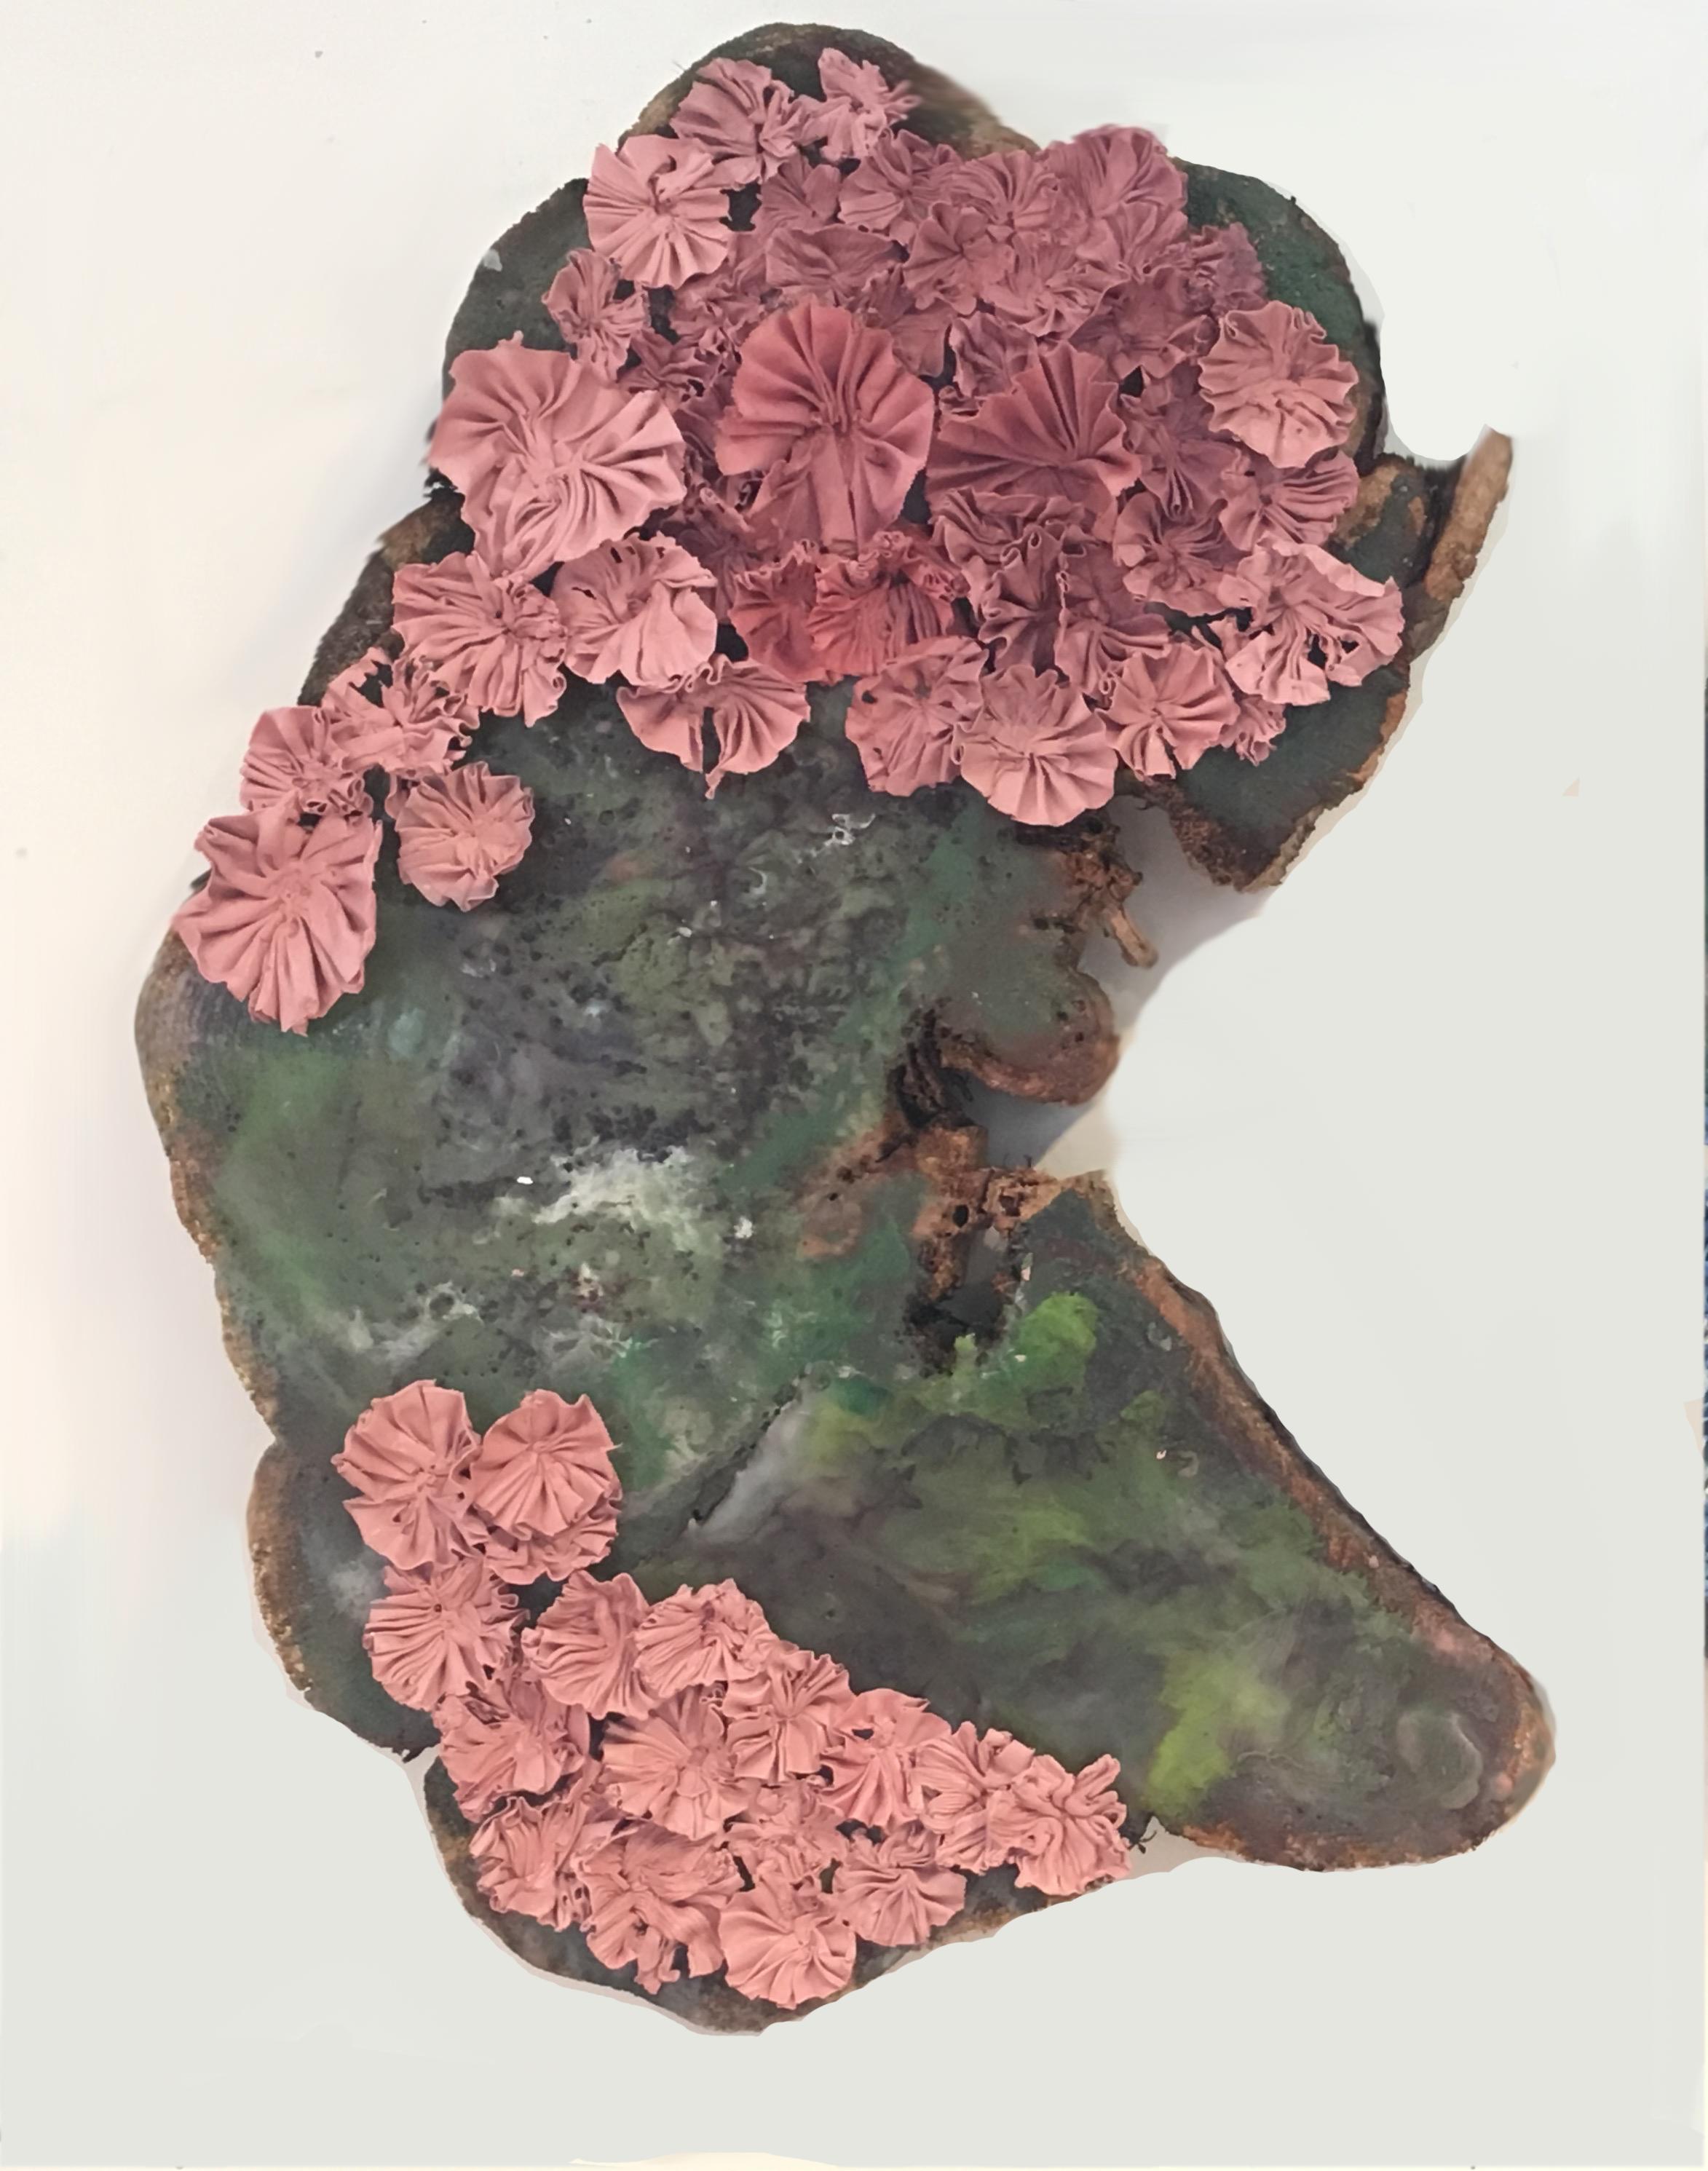 Scalloped Pink Mushrooms